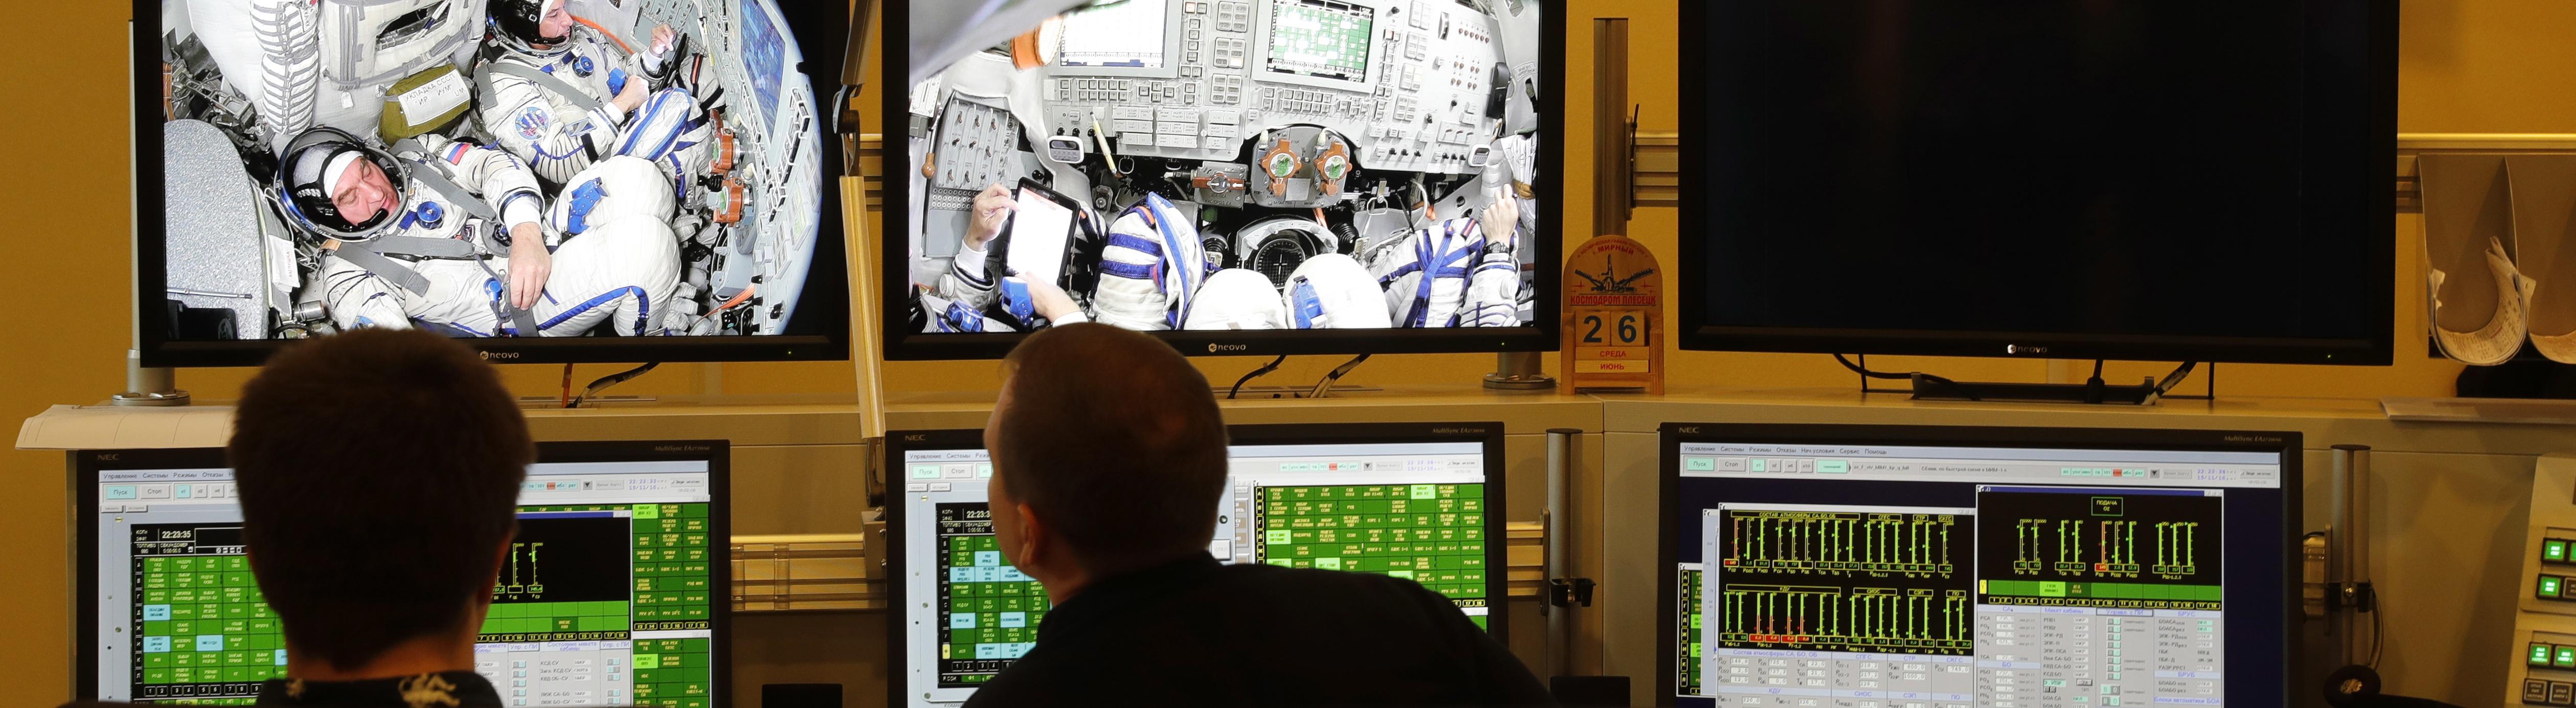 Astronautenausbildung